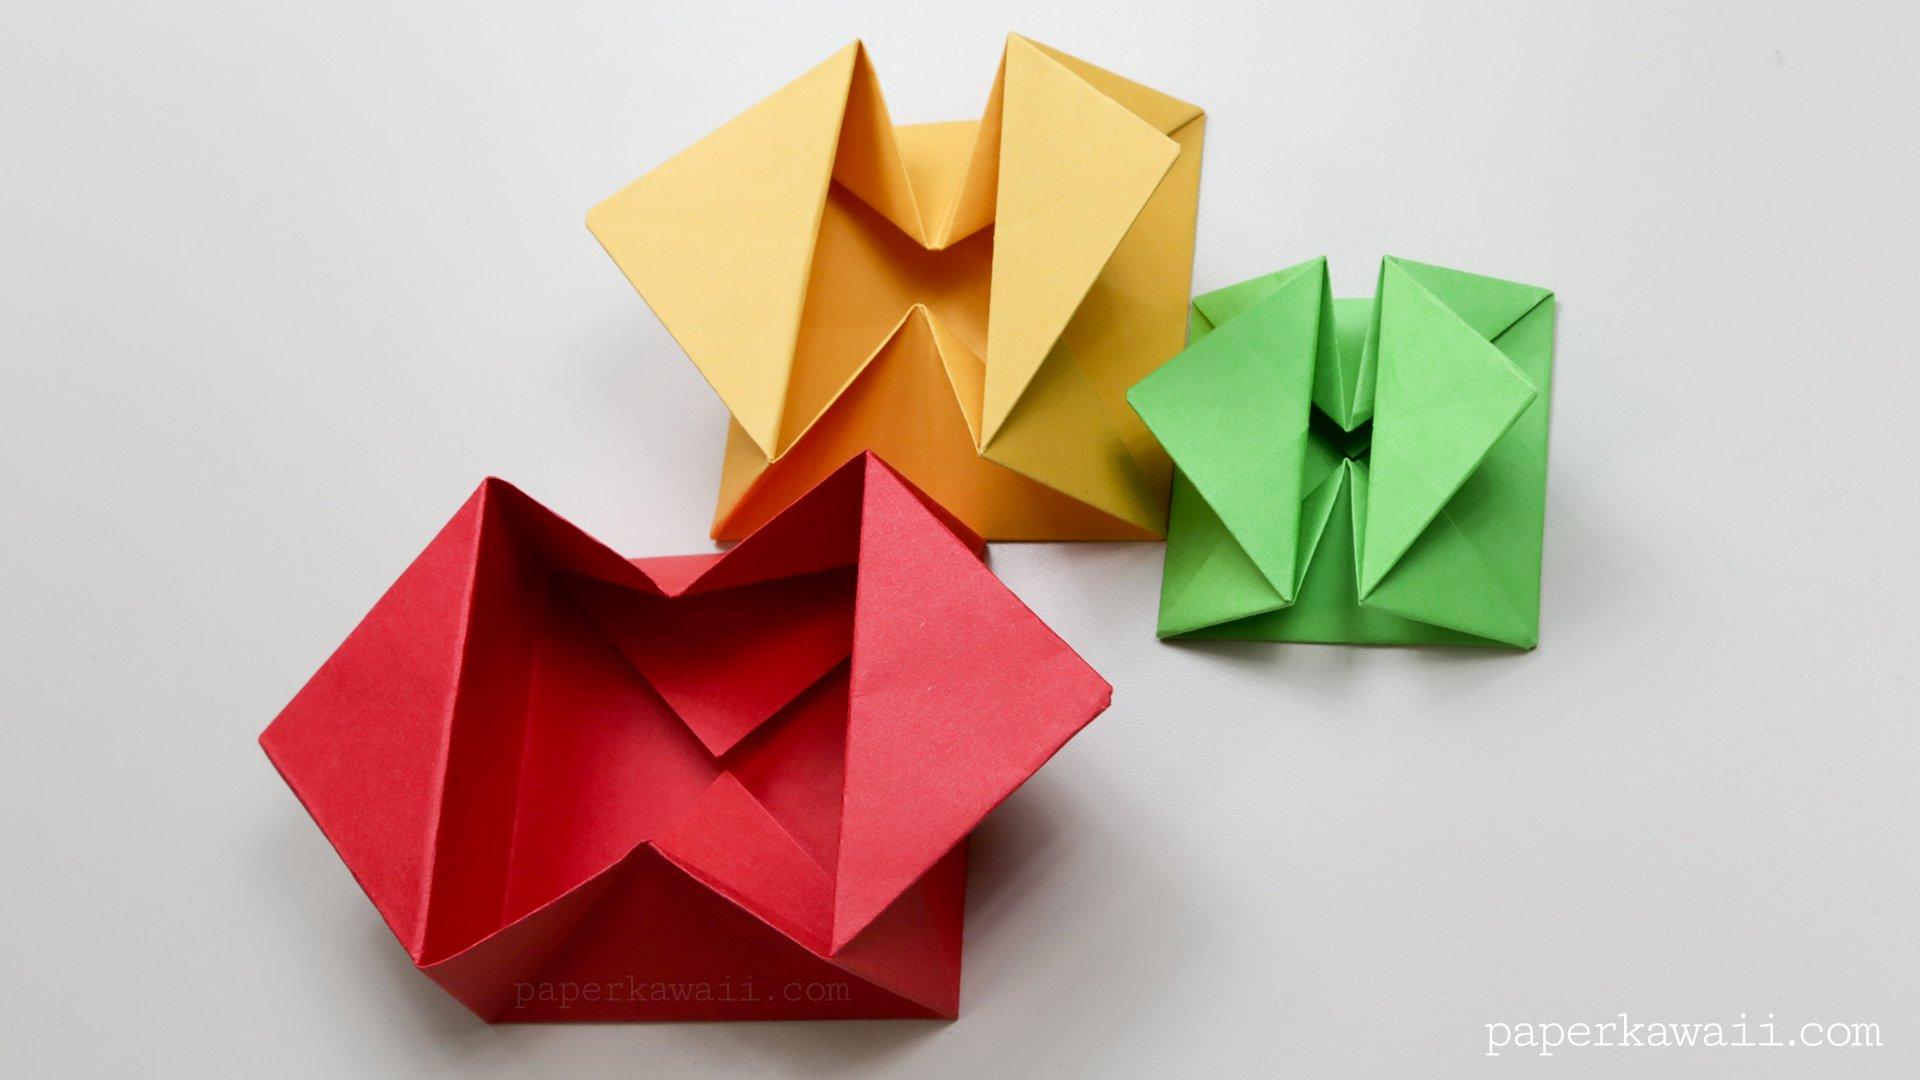 Origami Envelope Box Instructions - Paper Kawaii - photo#10